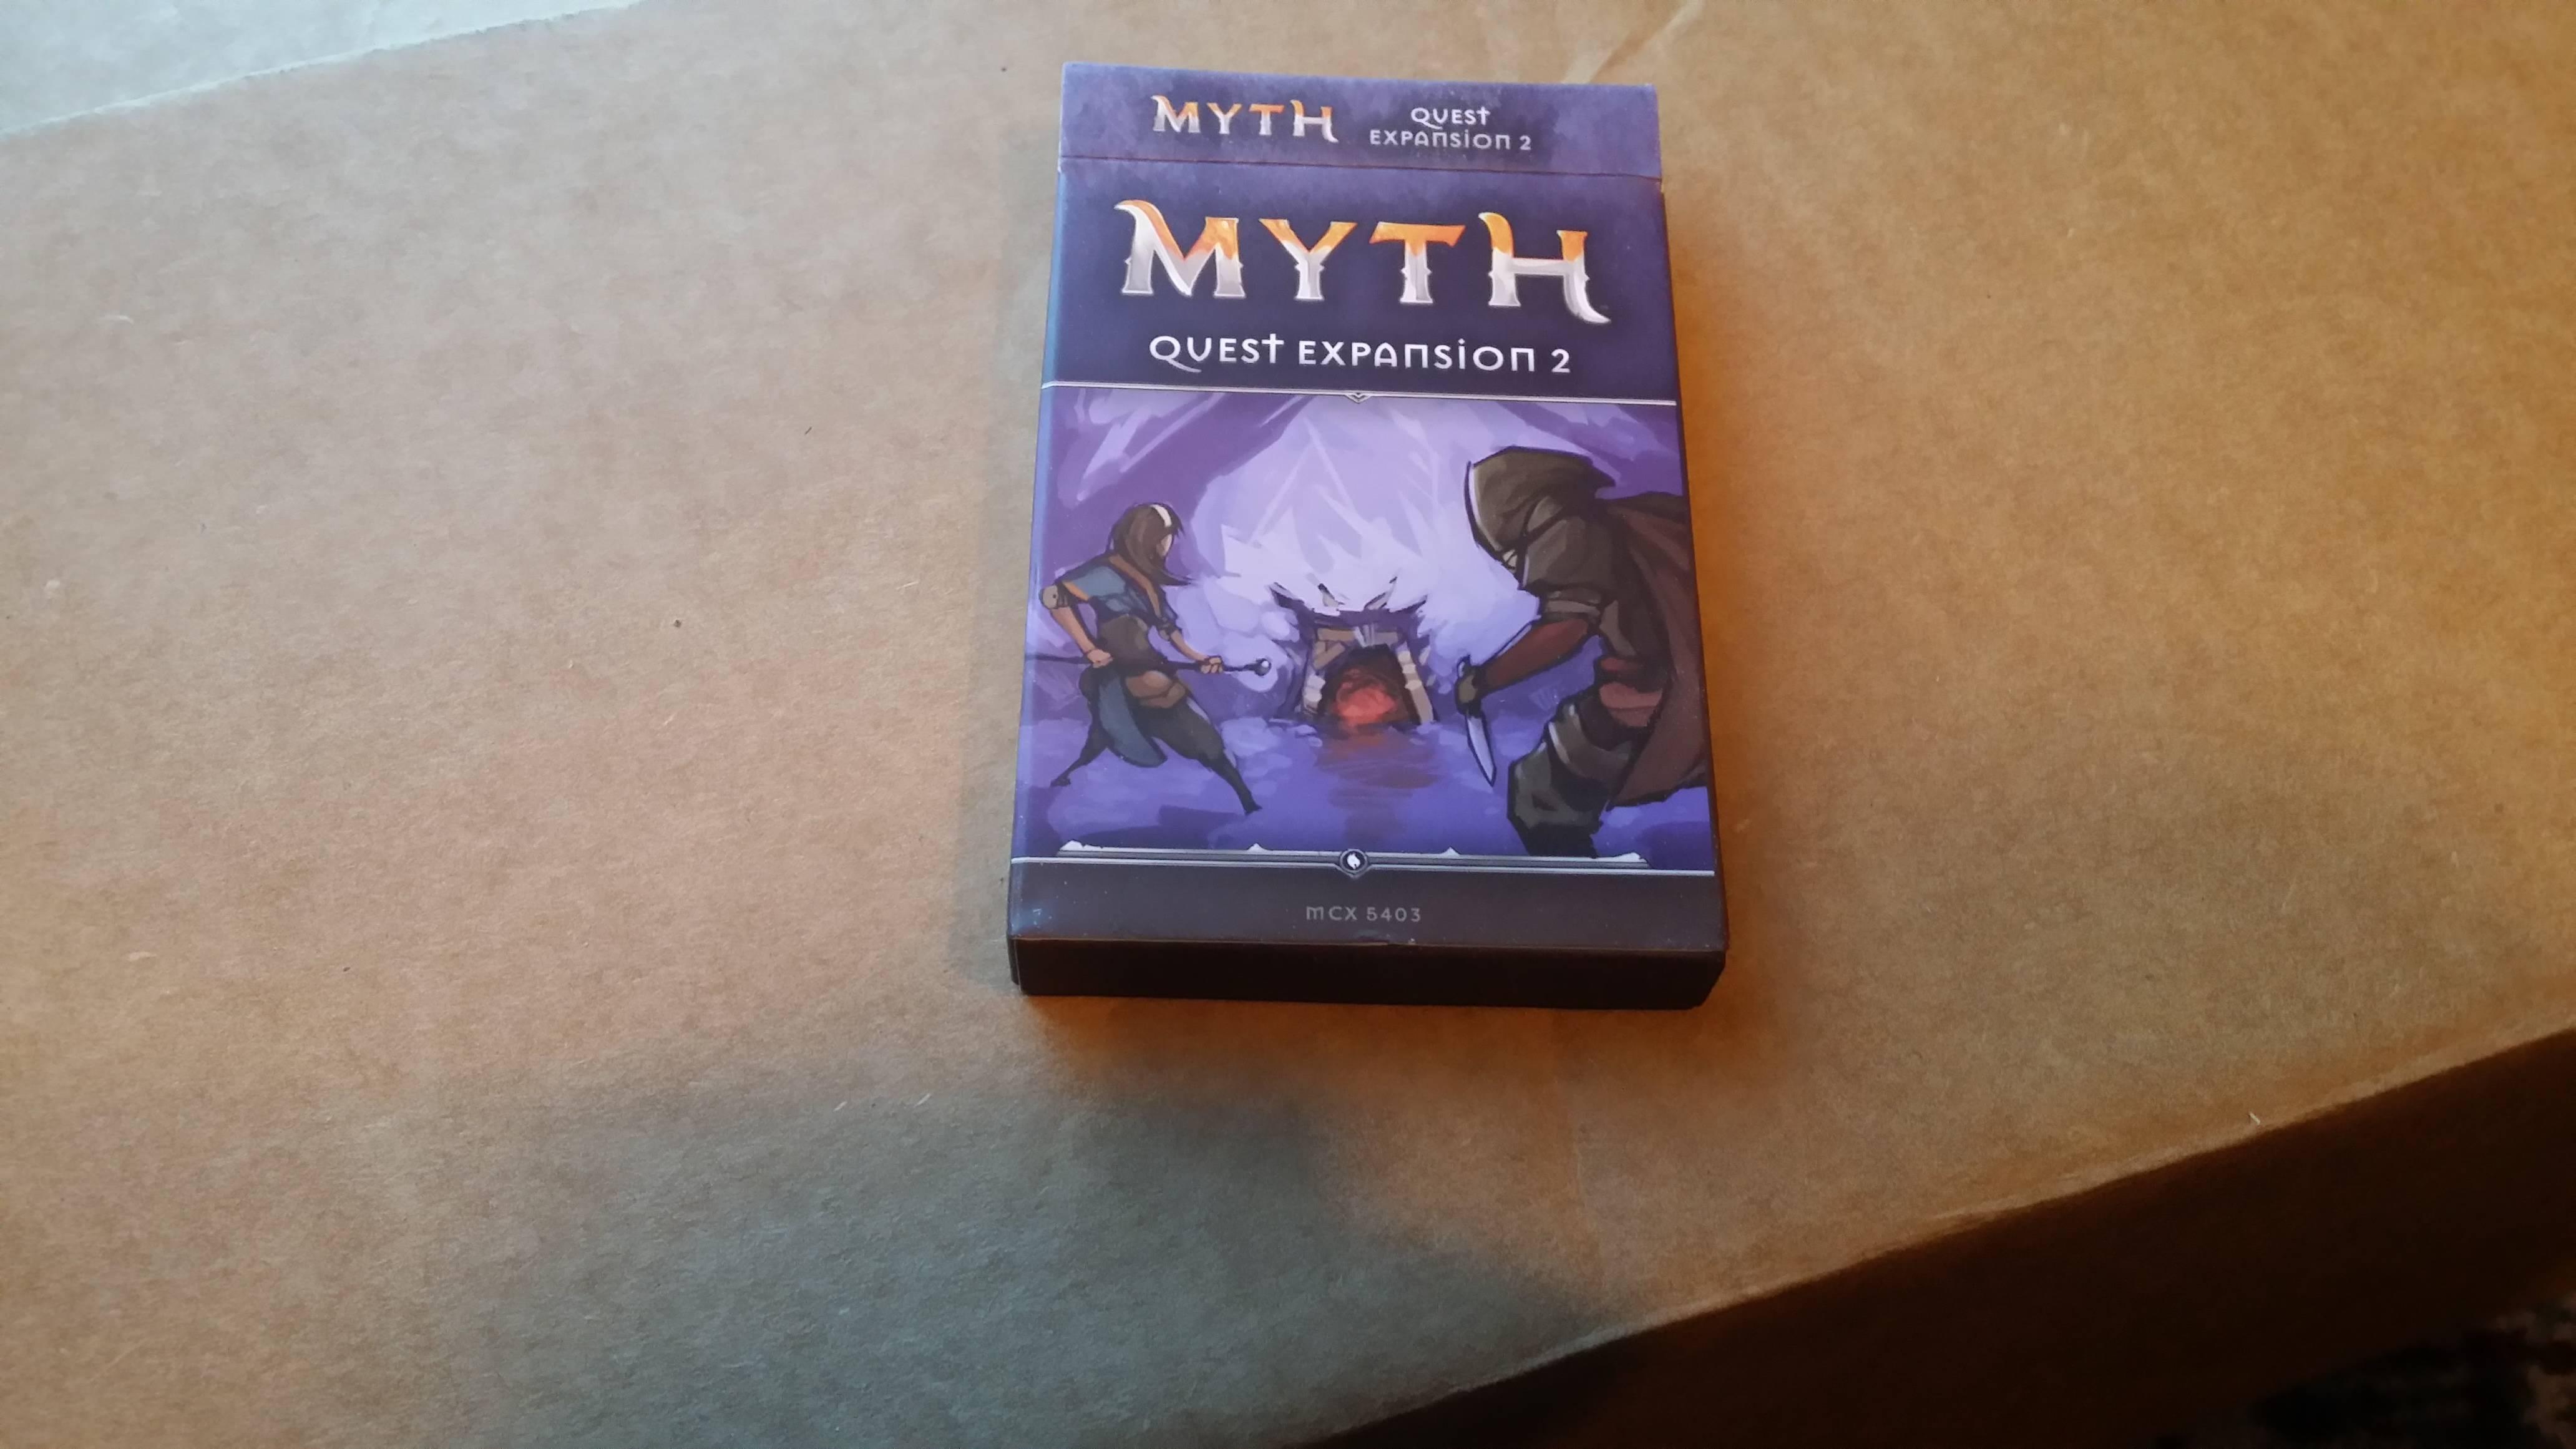 Myth - Quest Expansion 2